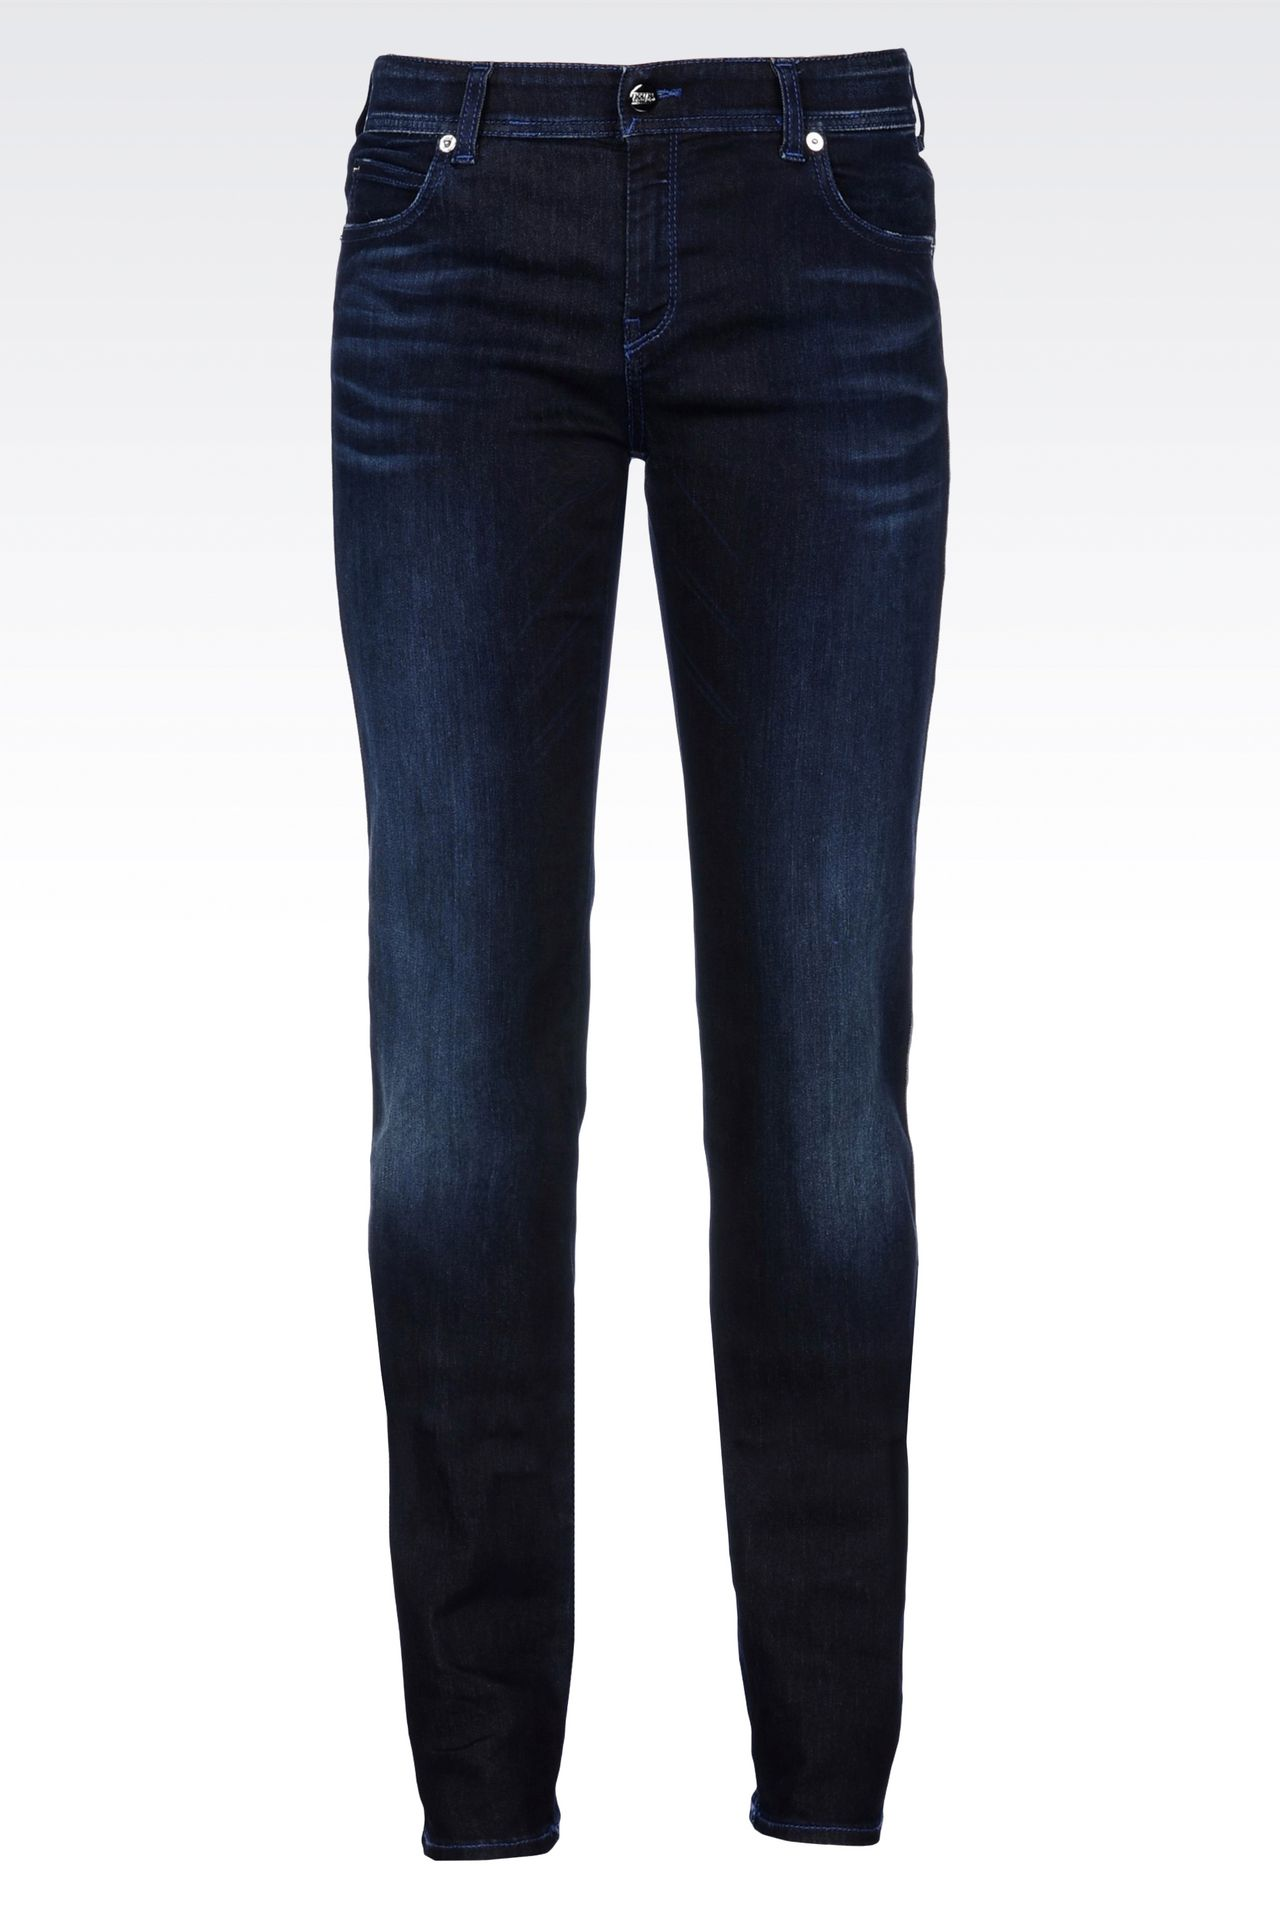 REGULAR FIT DARK WASH JEANS: Jeans Women by Armani - 0